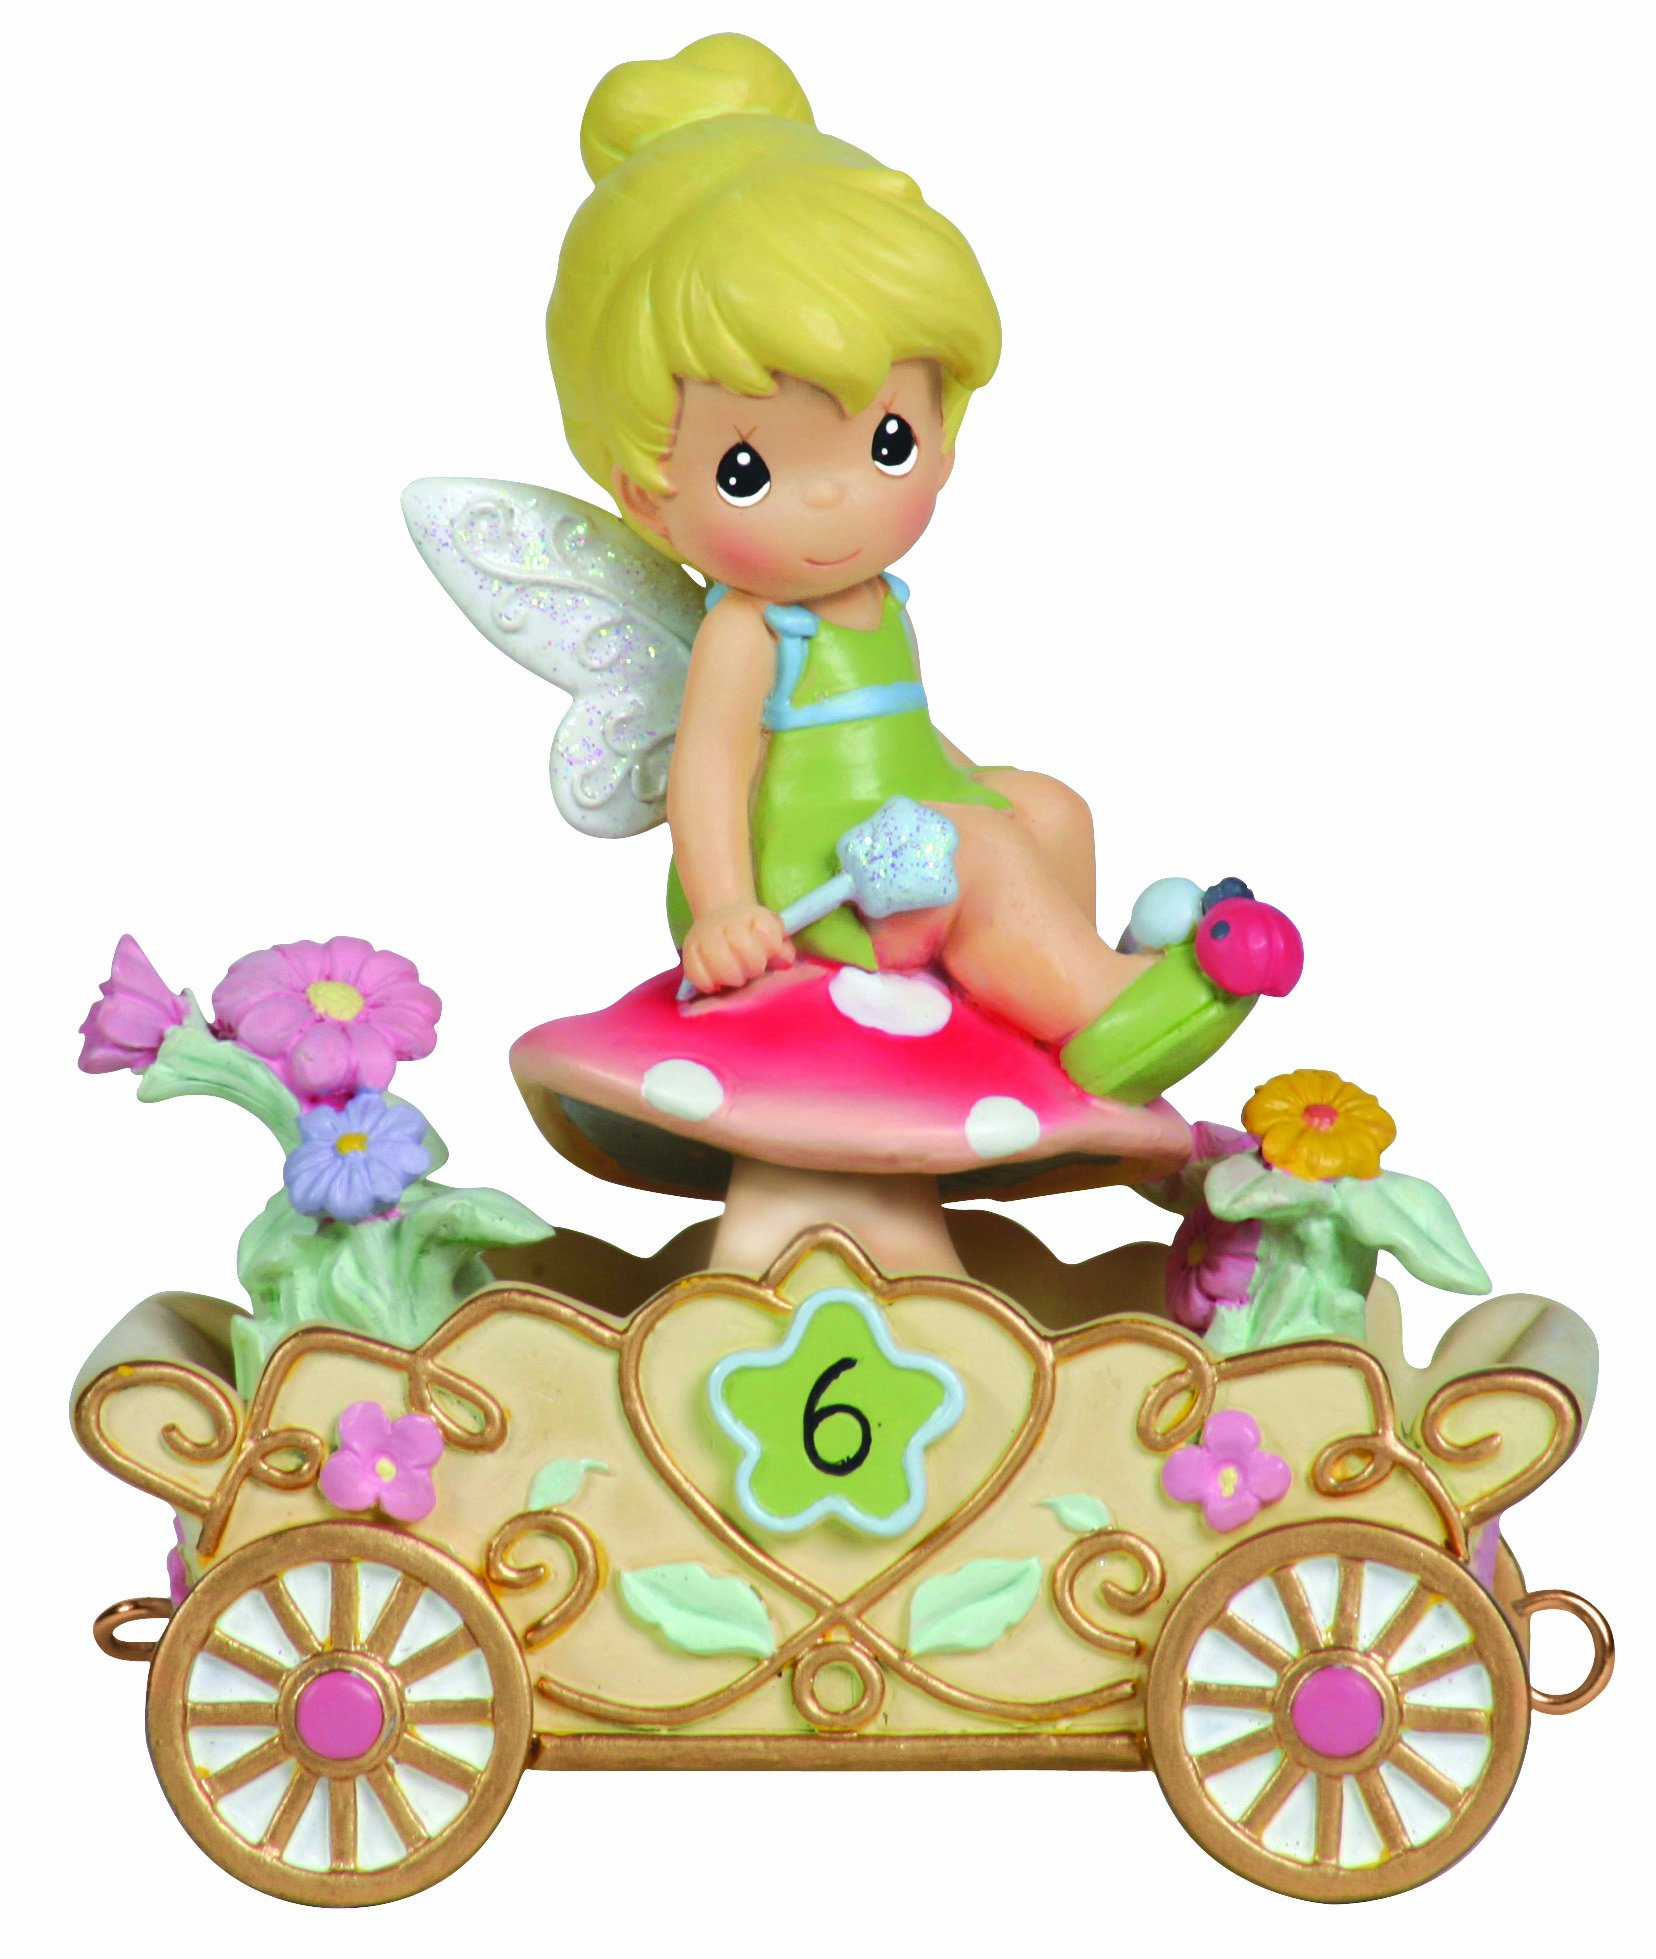 Precious Moments, Disney Showcase Collection,  Have A Fairy Happy Birthday, Disney Birthday Parade, Age 6, Resin Figurine, 104408